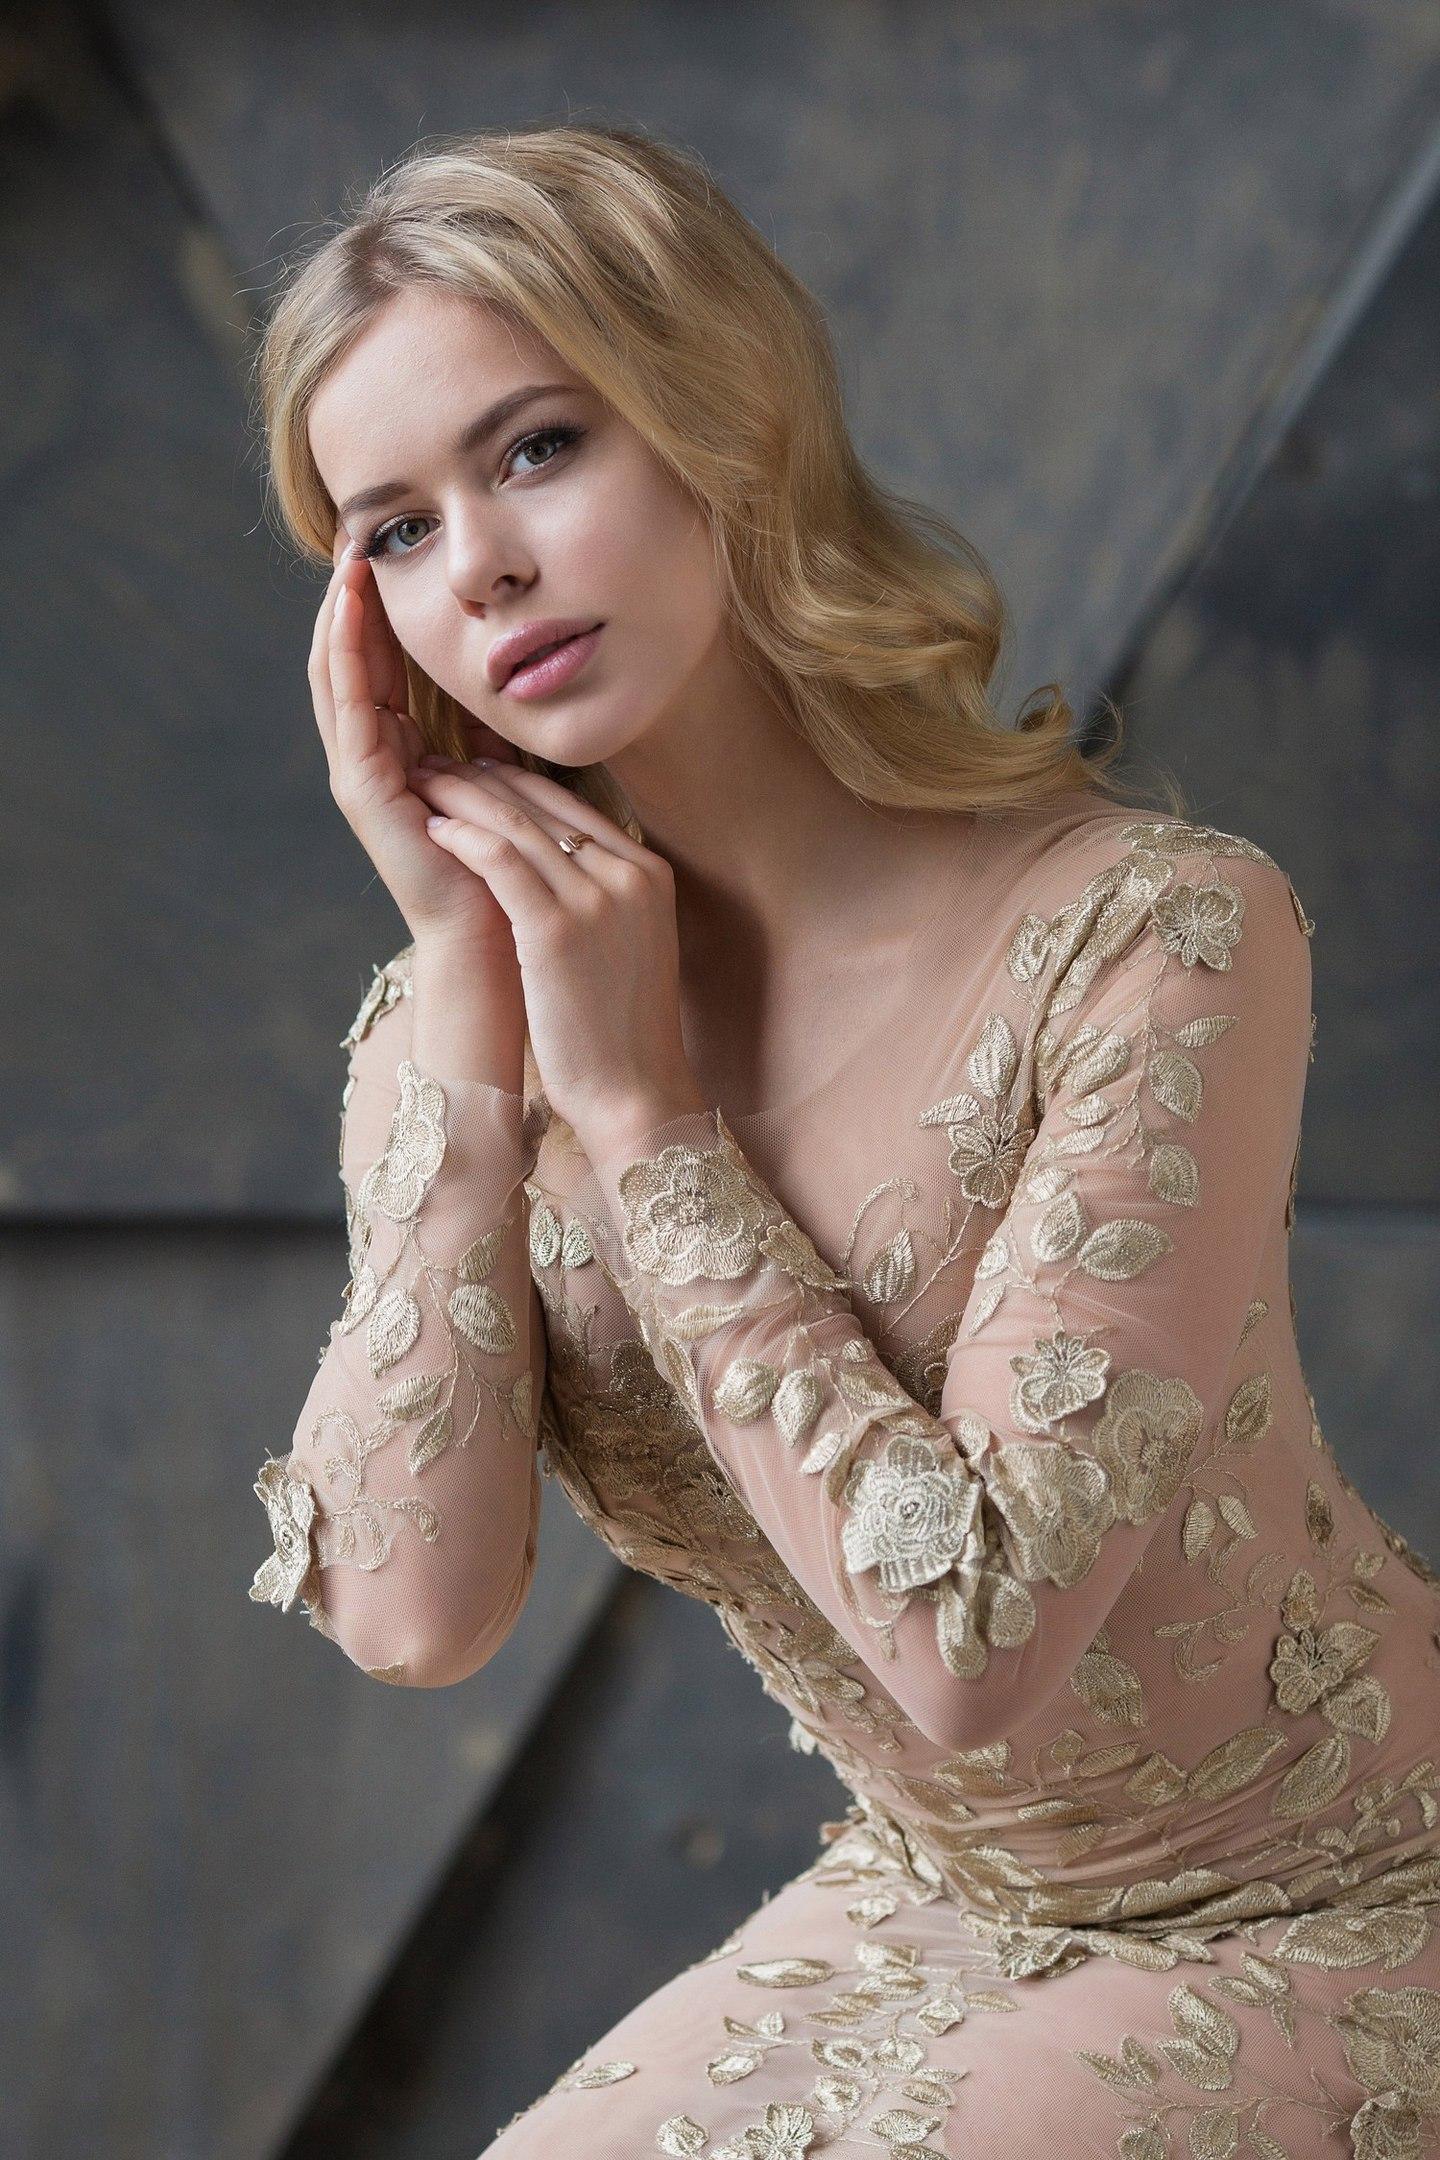 Анна Погорилая-2 5p9ZeoIihu8